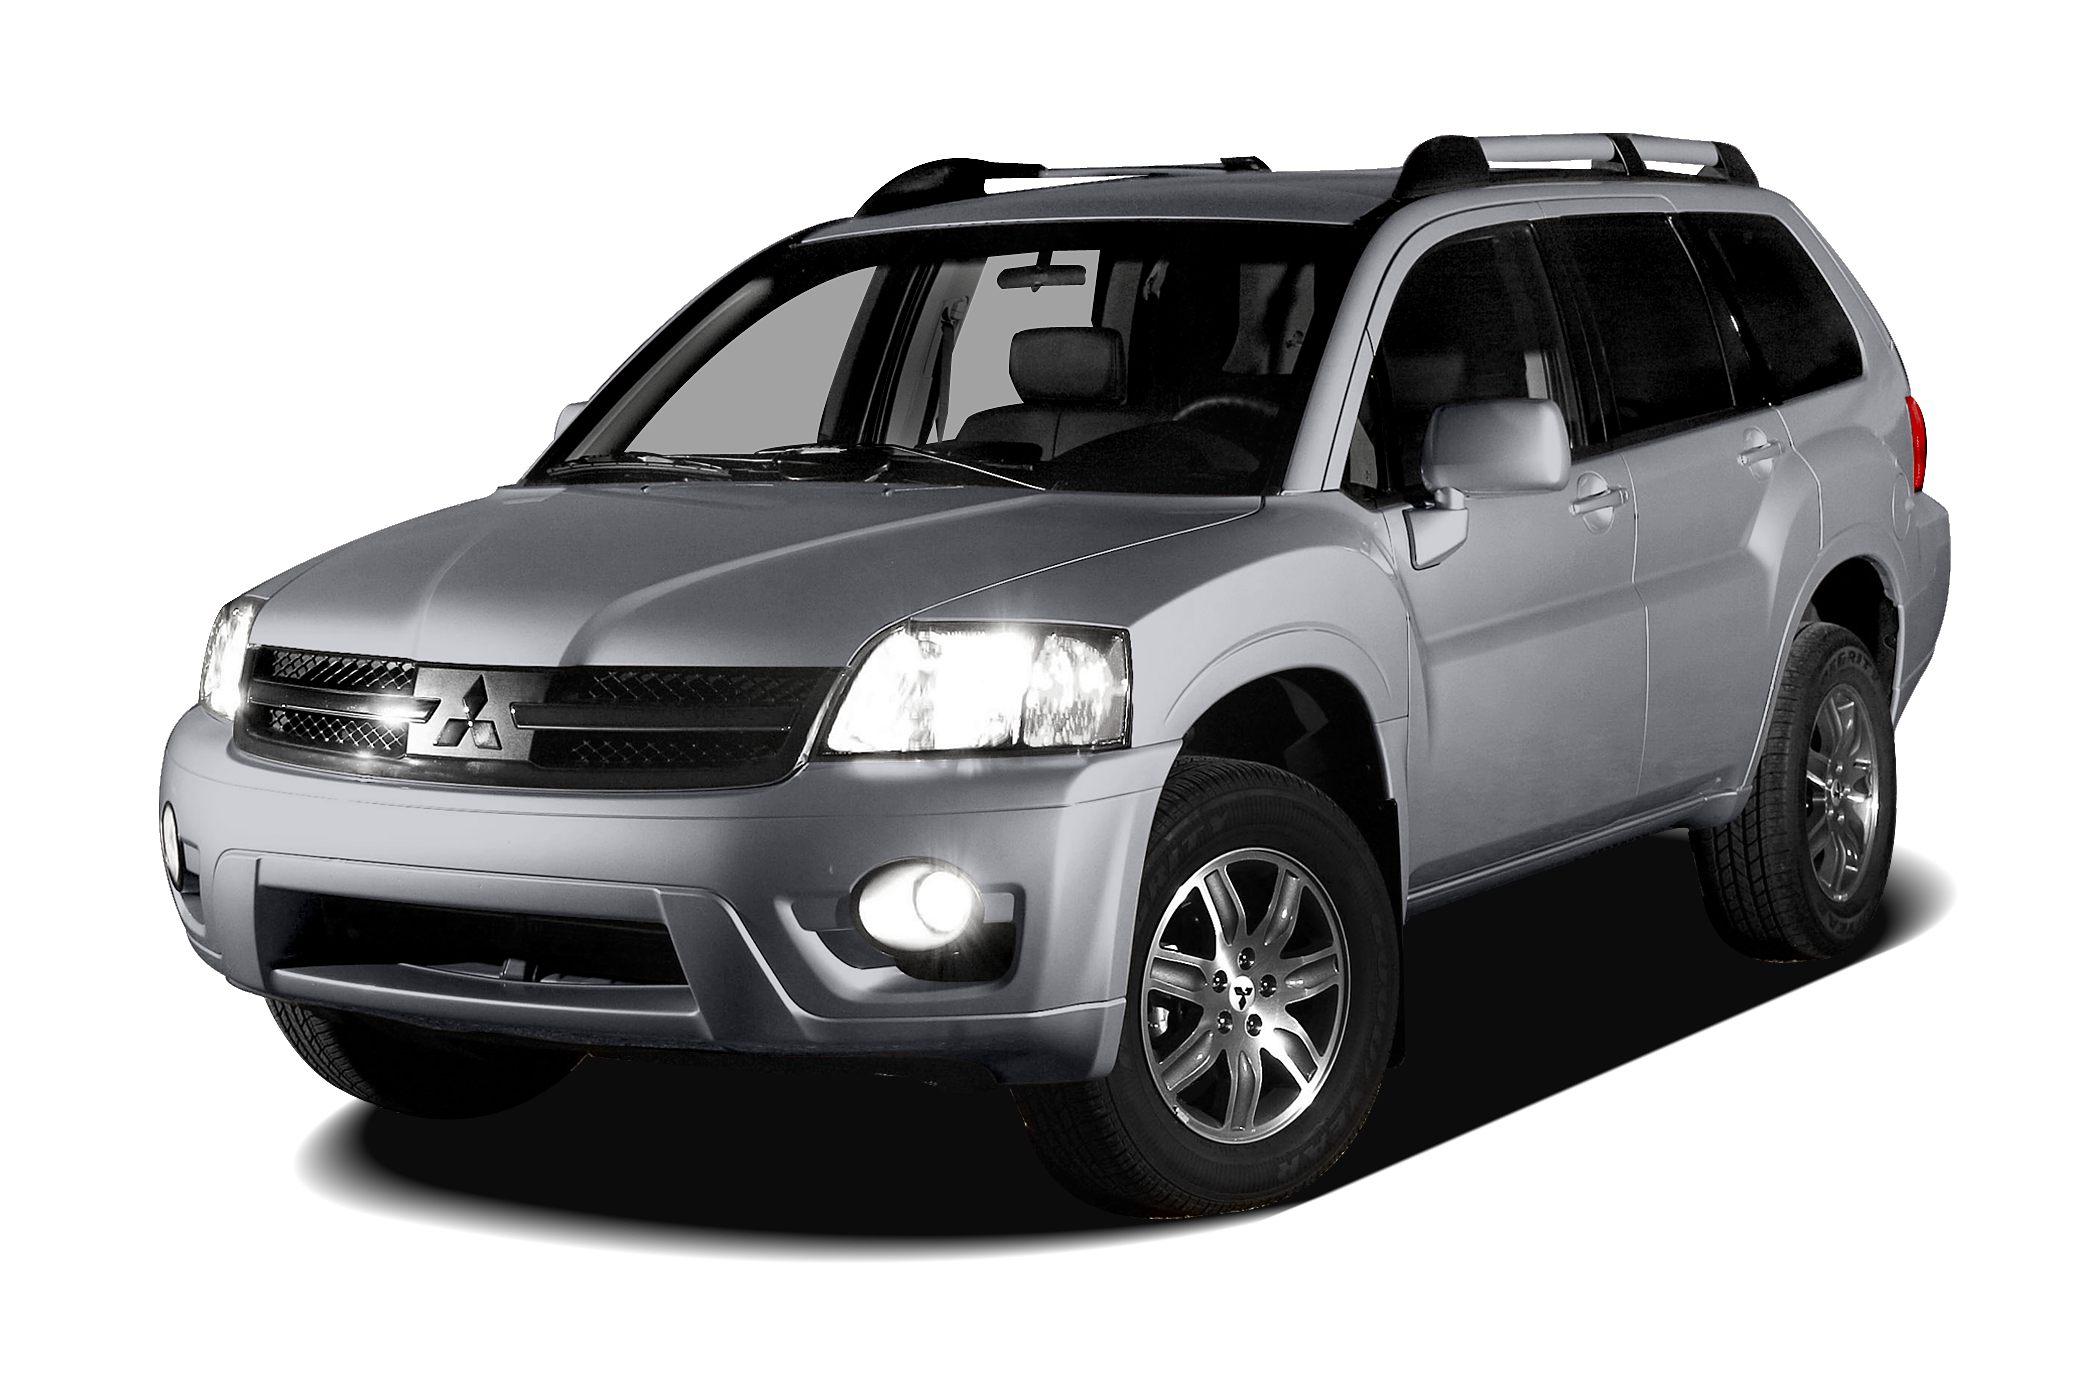 2008 Mitsubishi Endeavor